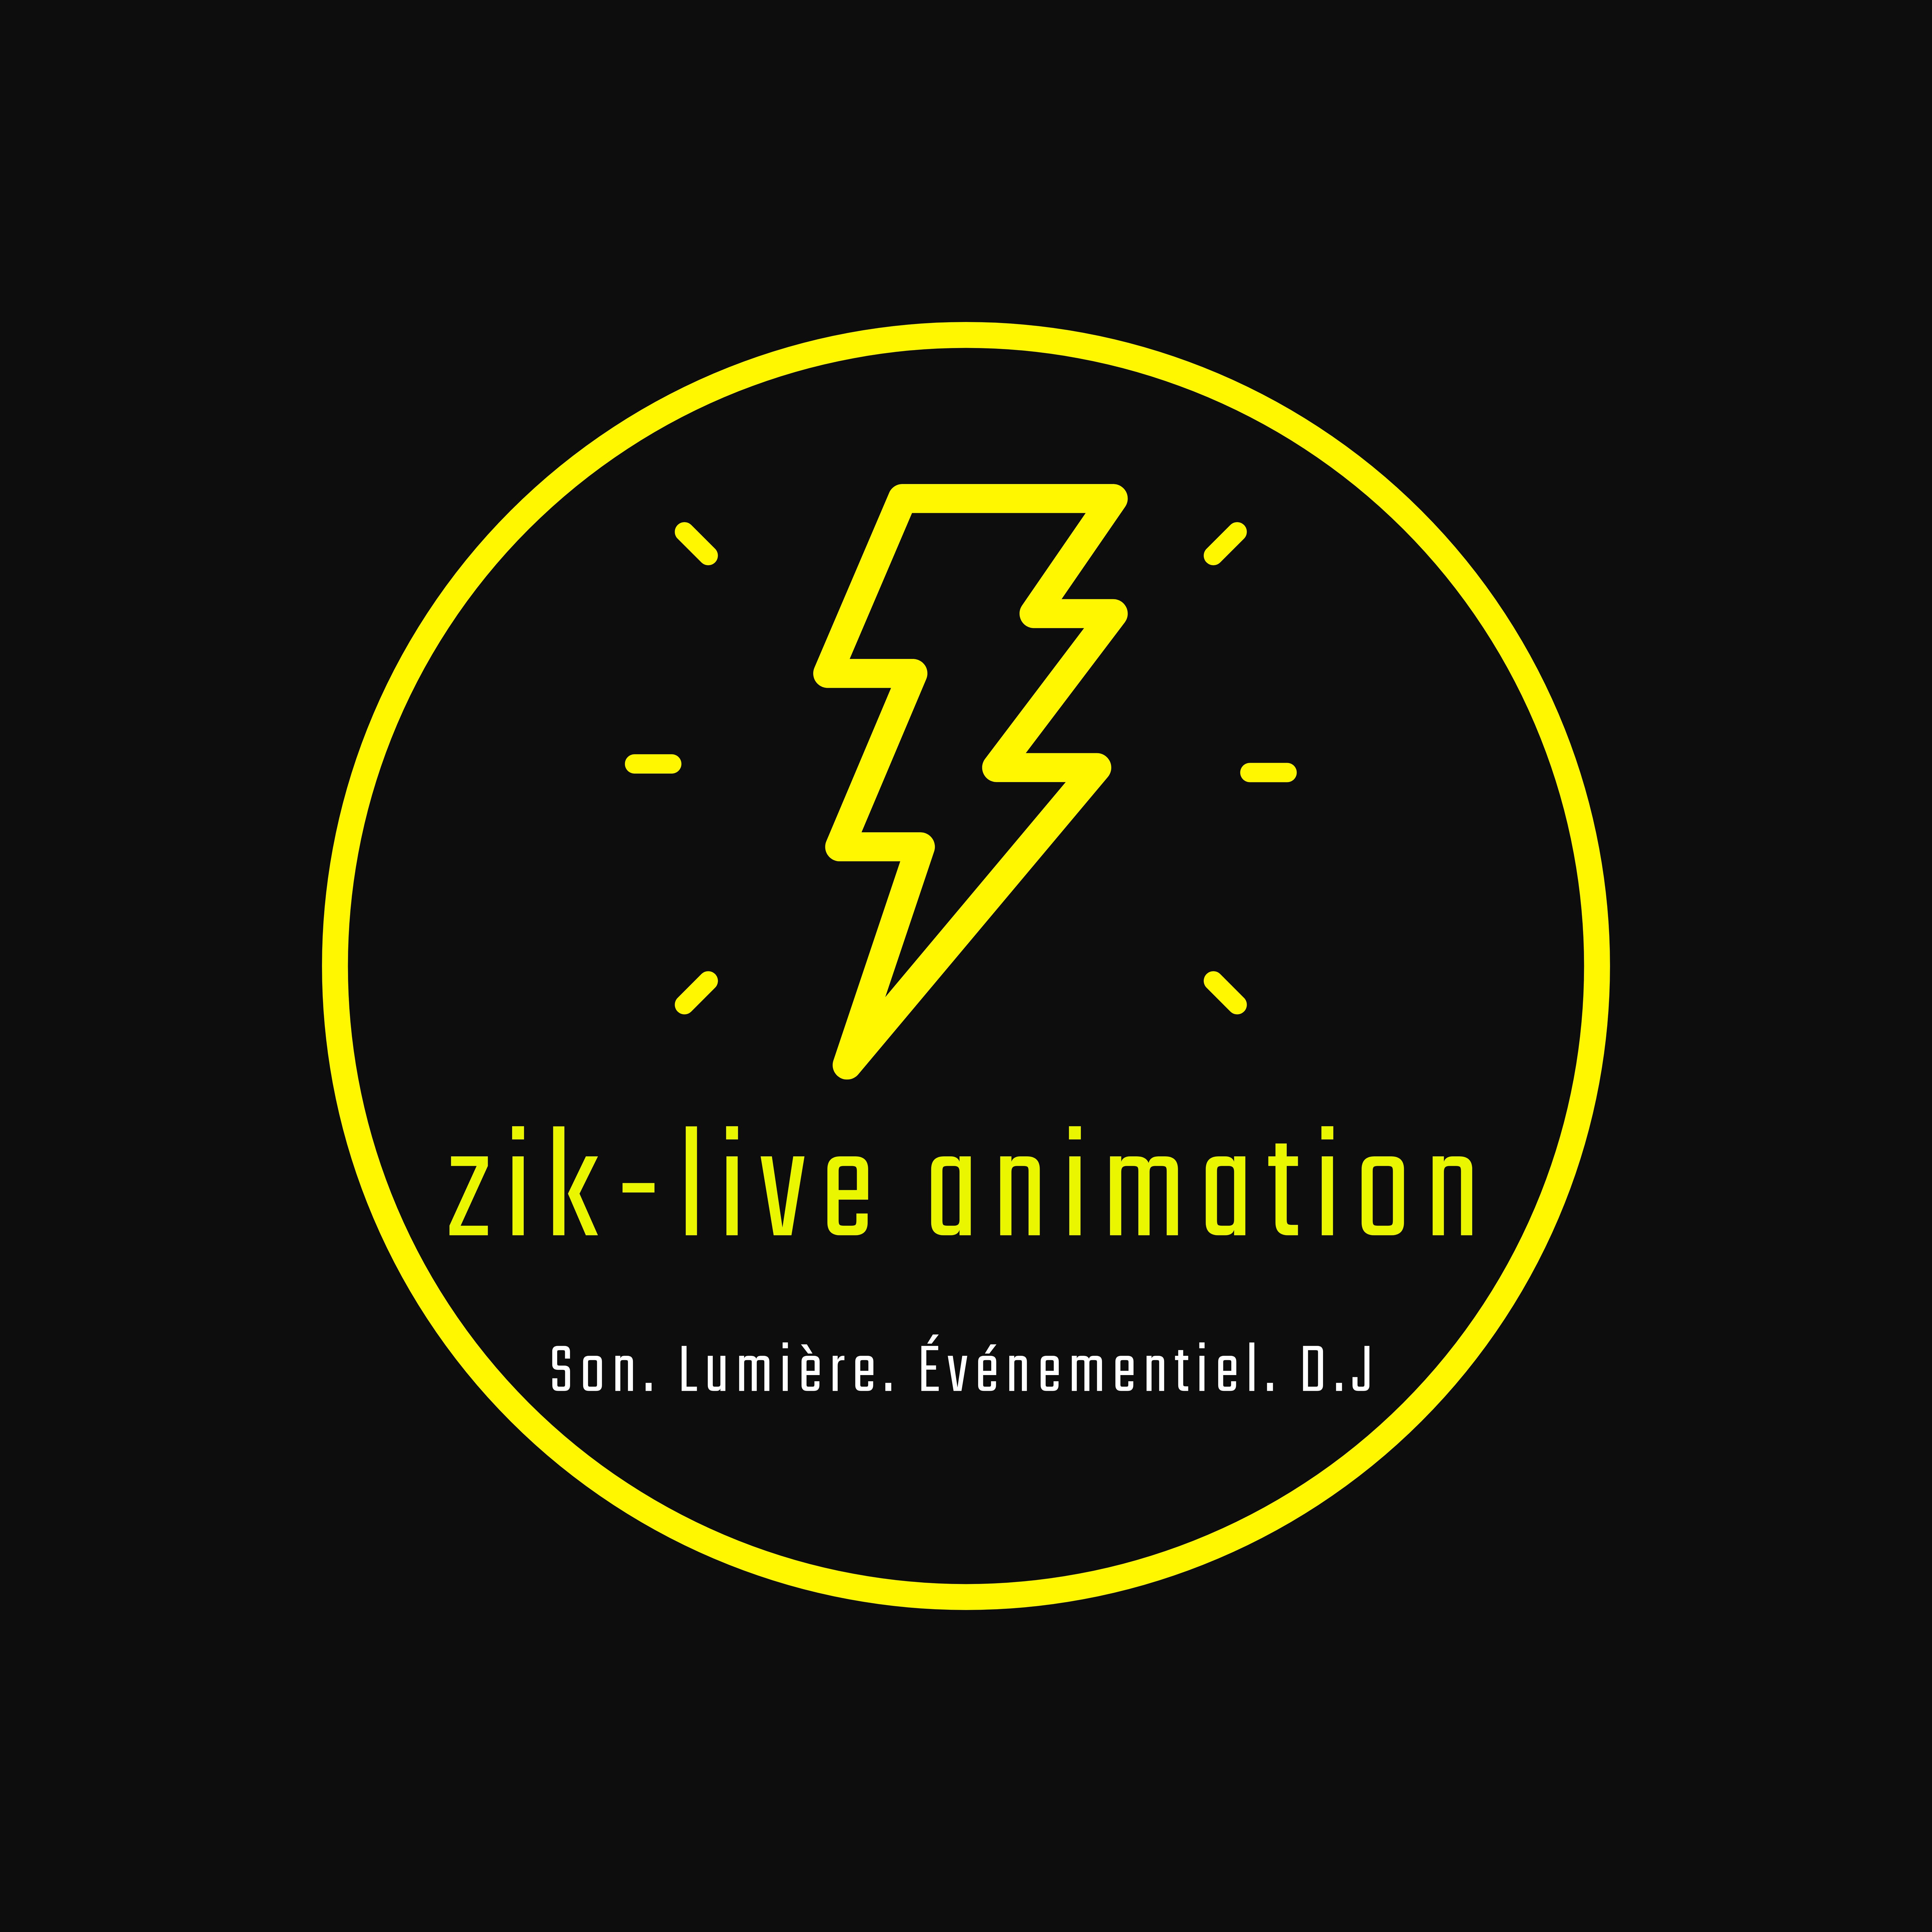 zik-live animation